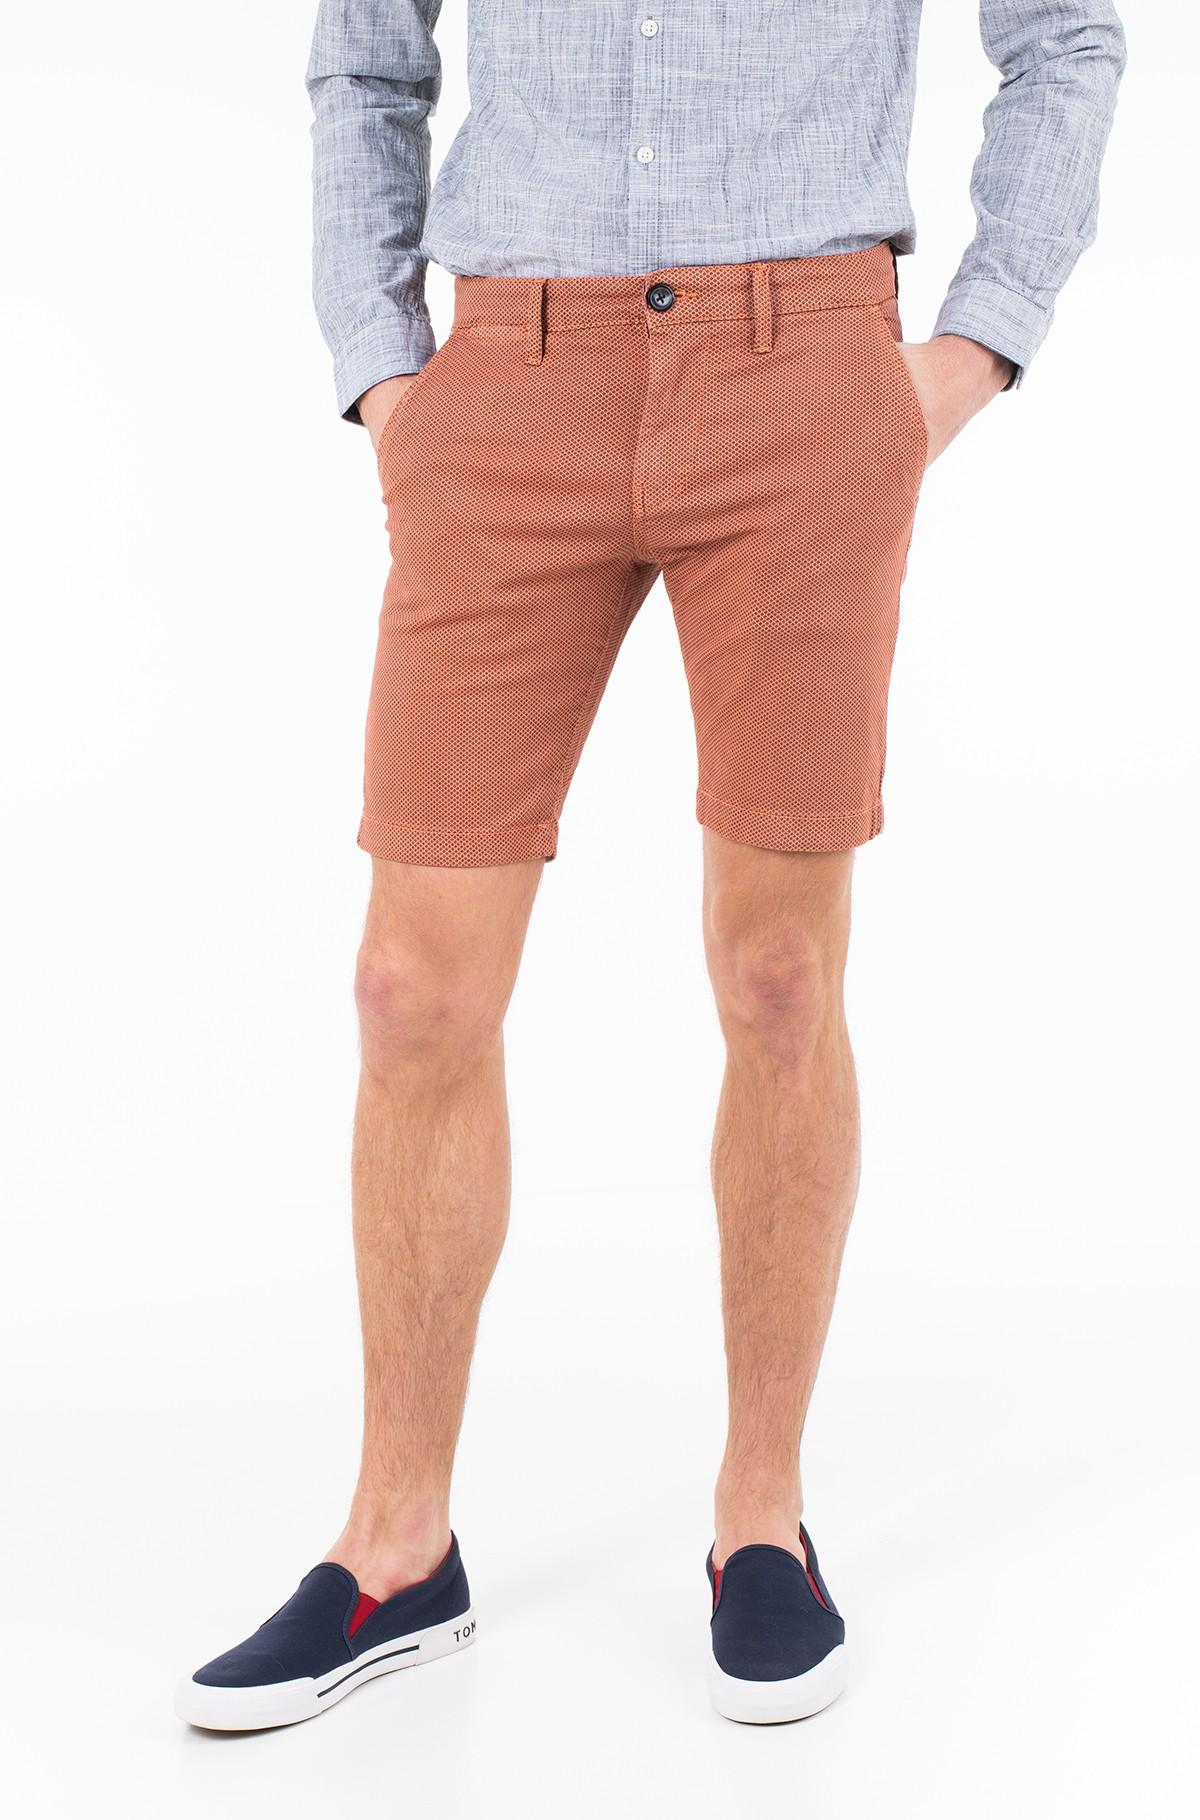 Shorts CHARLY SHORT MIRCO/PM800717-full-1